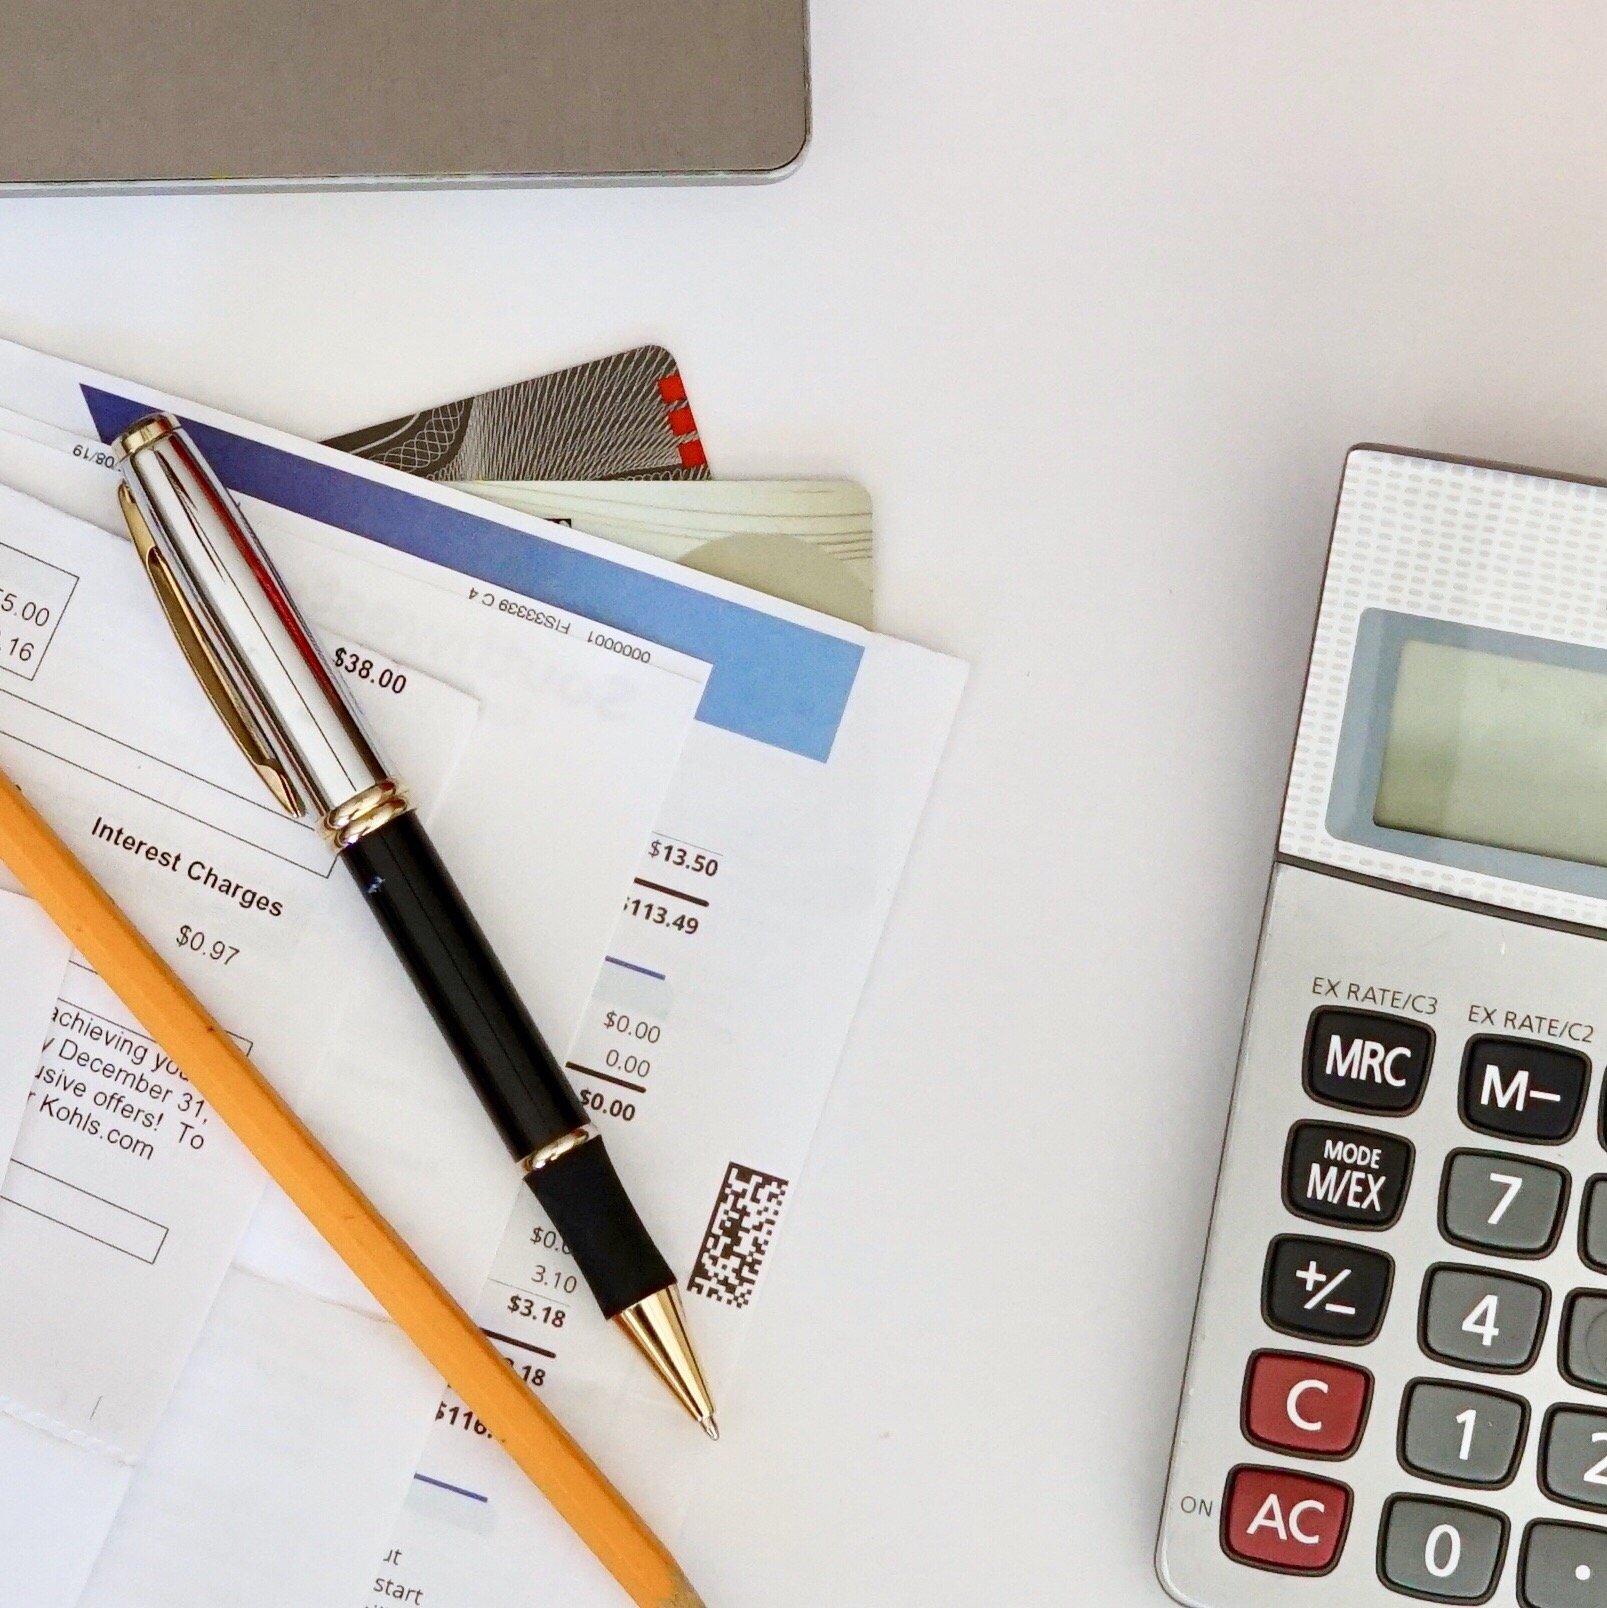 paying-bills-credit-cards-overhead-view-desktop-calculator-pen-and-pencil-creditrating_t20_joV0Gp